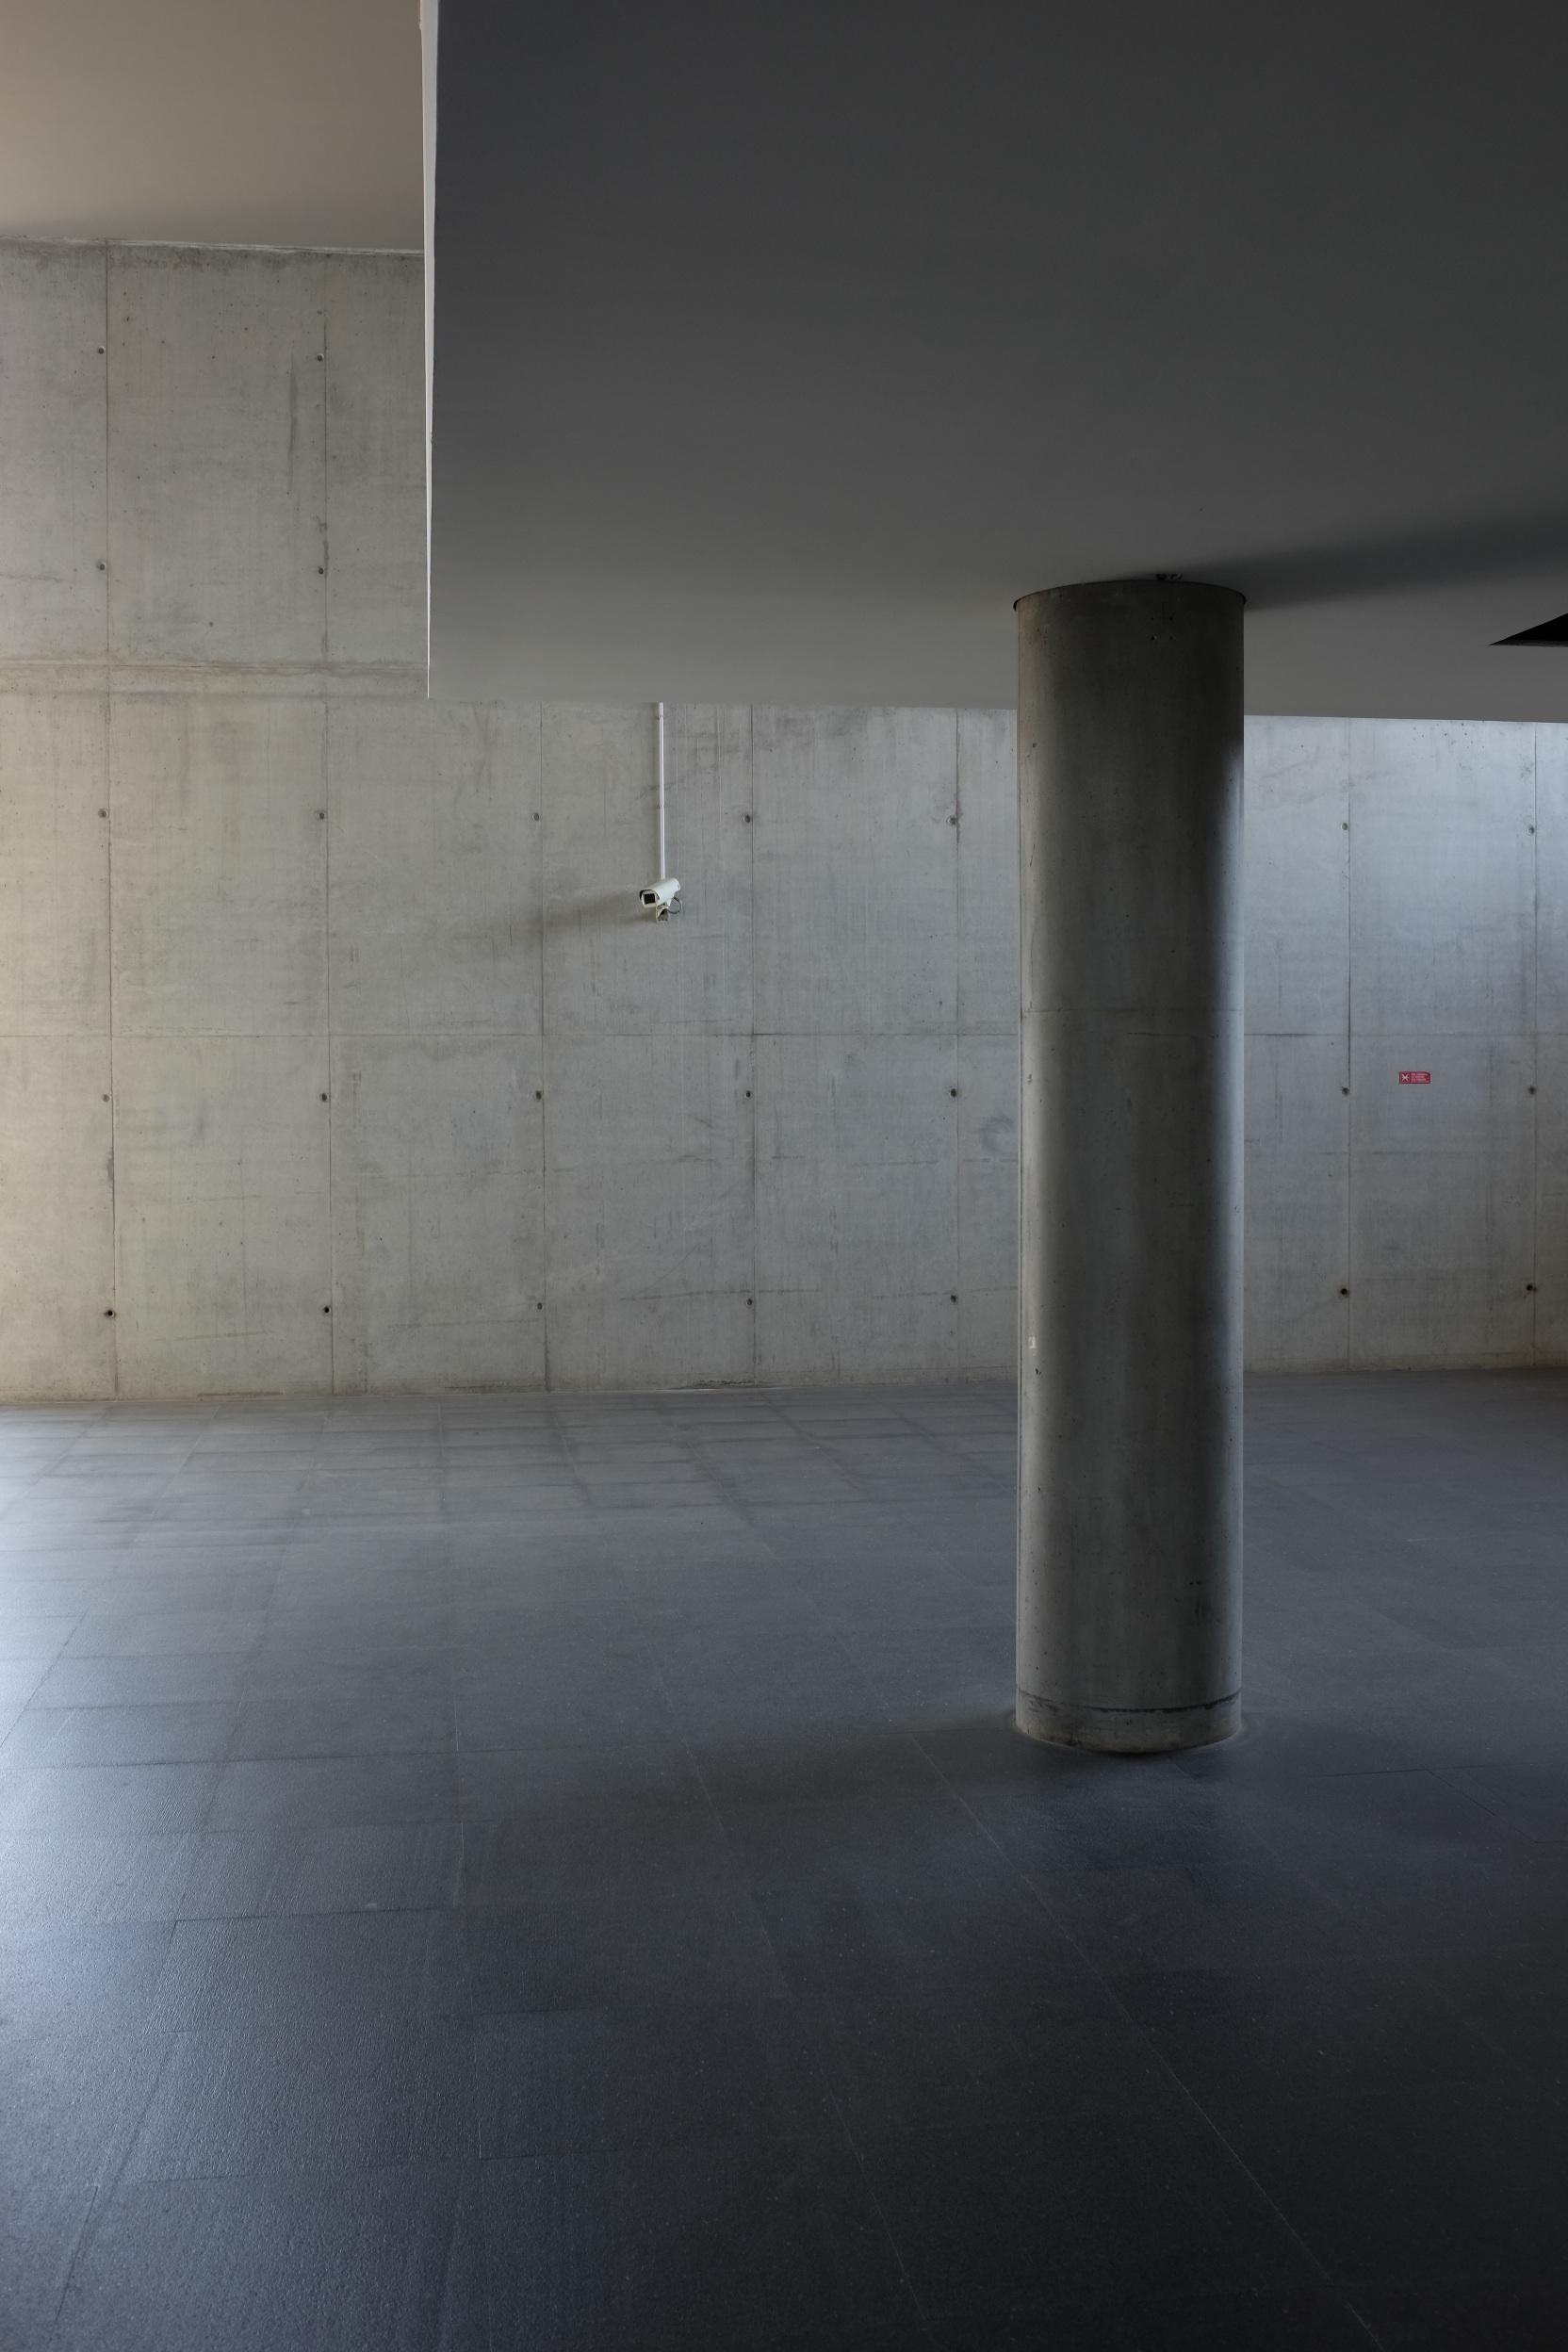 Lås, Skånela, Larm Brytskydd, Låshus, Nyckel, Cylinder, Fönsterlås, Altanlås, Säkerhetshandtag, Dörrhandtag, Kameralam, IP-Kamera, CCTV, Rådgivning, Kontakta, Säkerhetslösning, Kameralösning